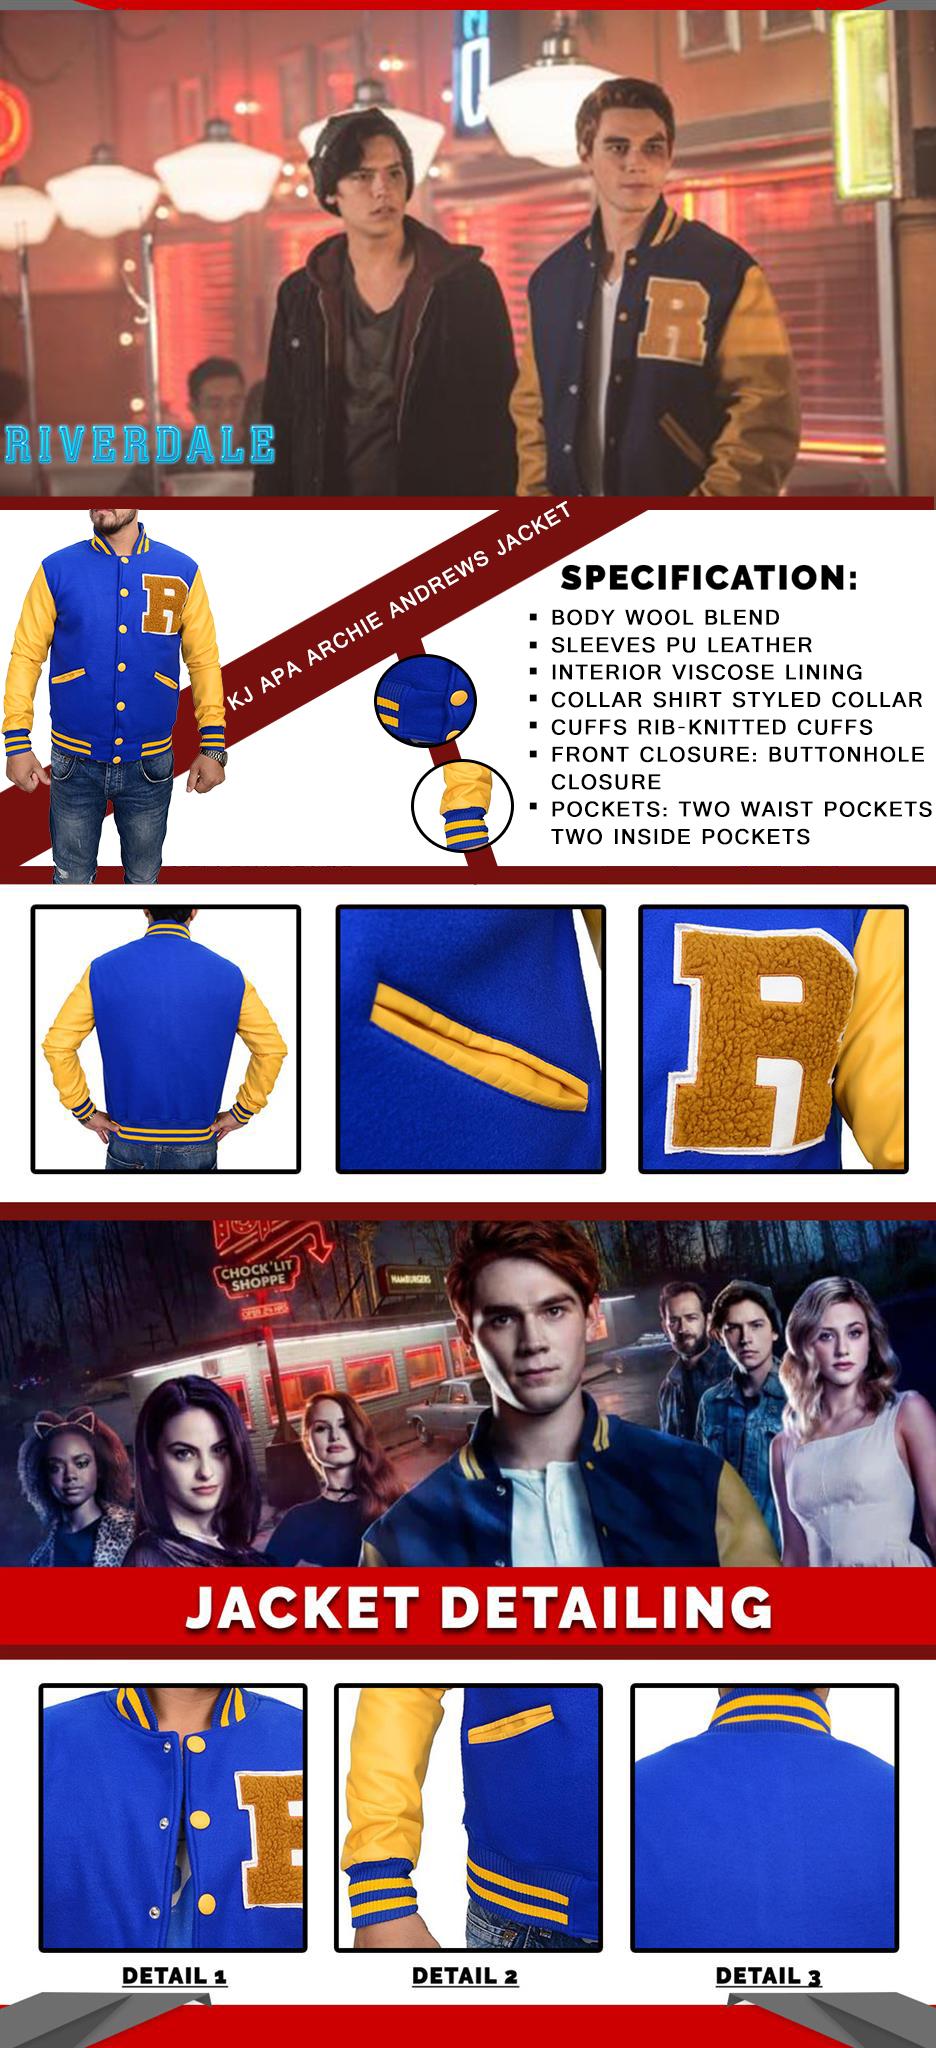 Riverdale K.J Apa Archie Andrews Varsity Jacket Infographi